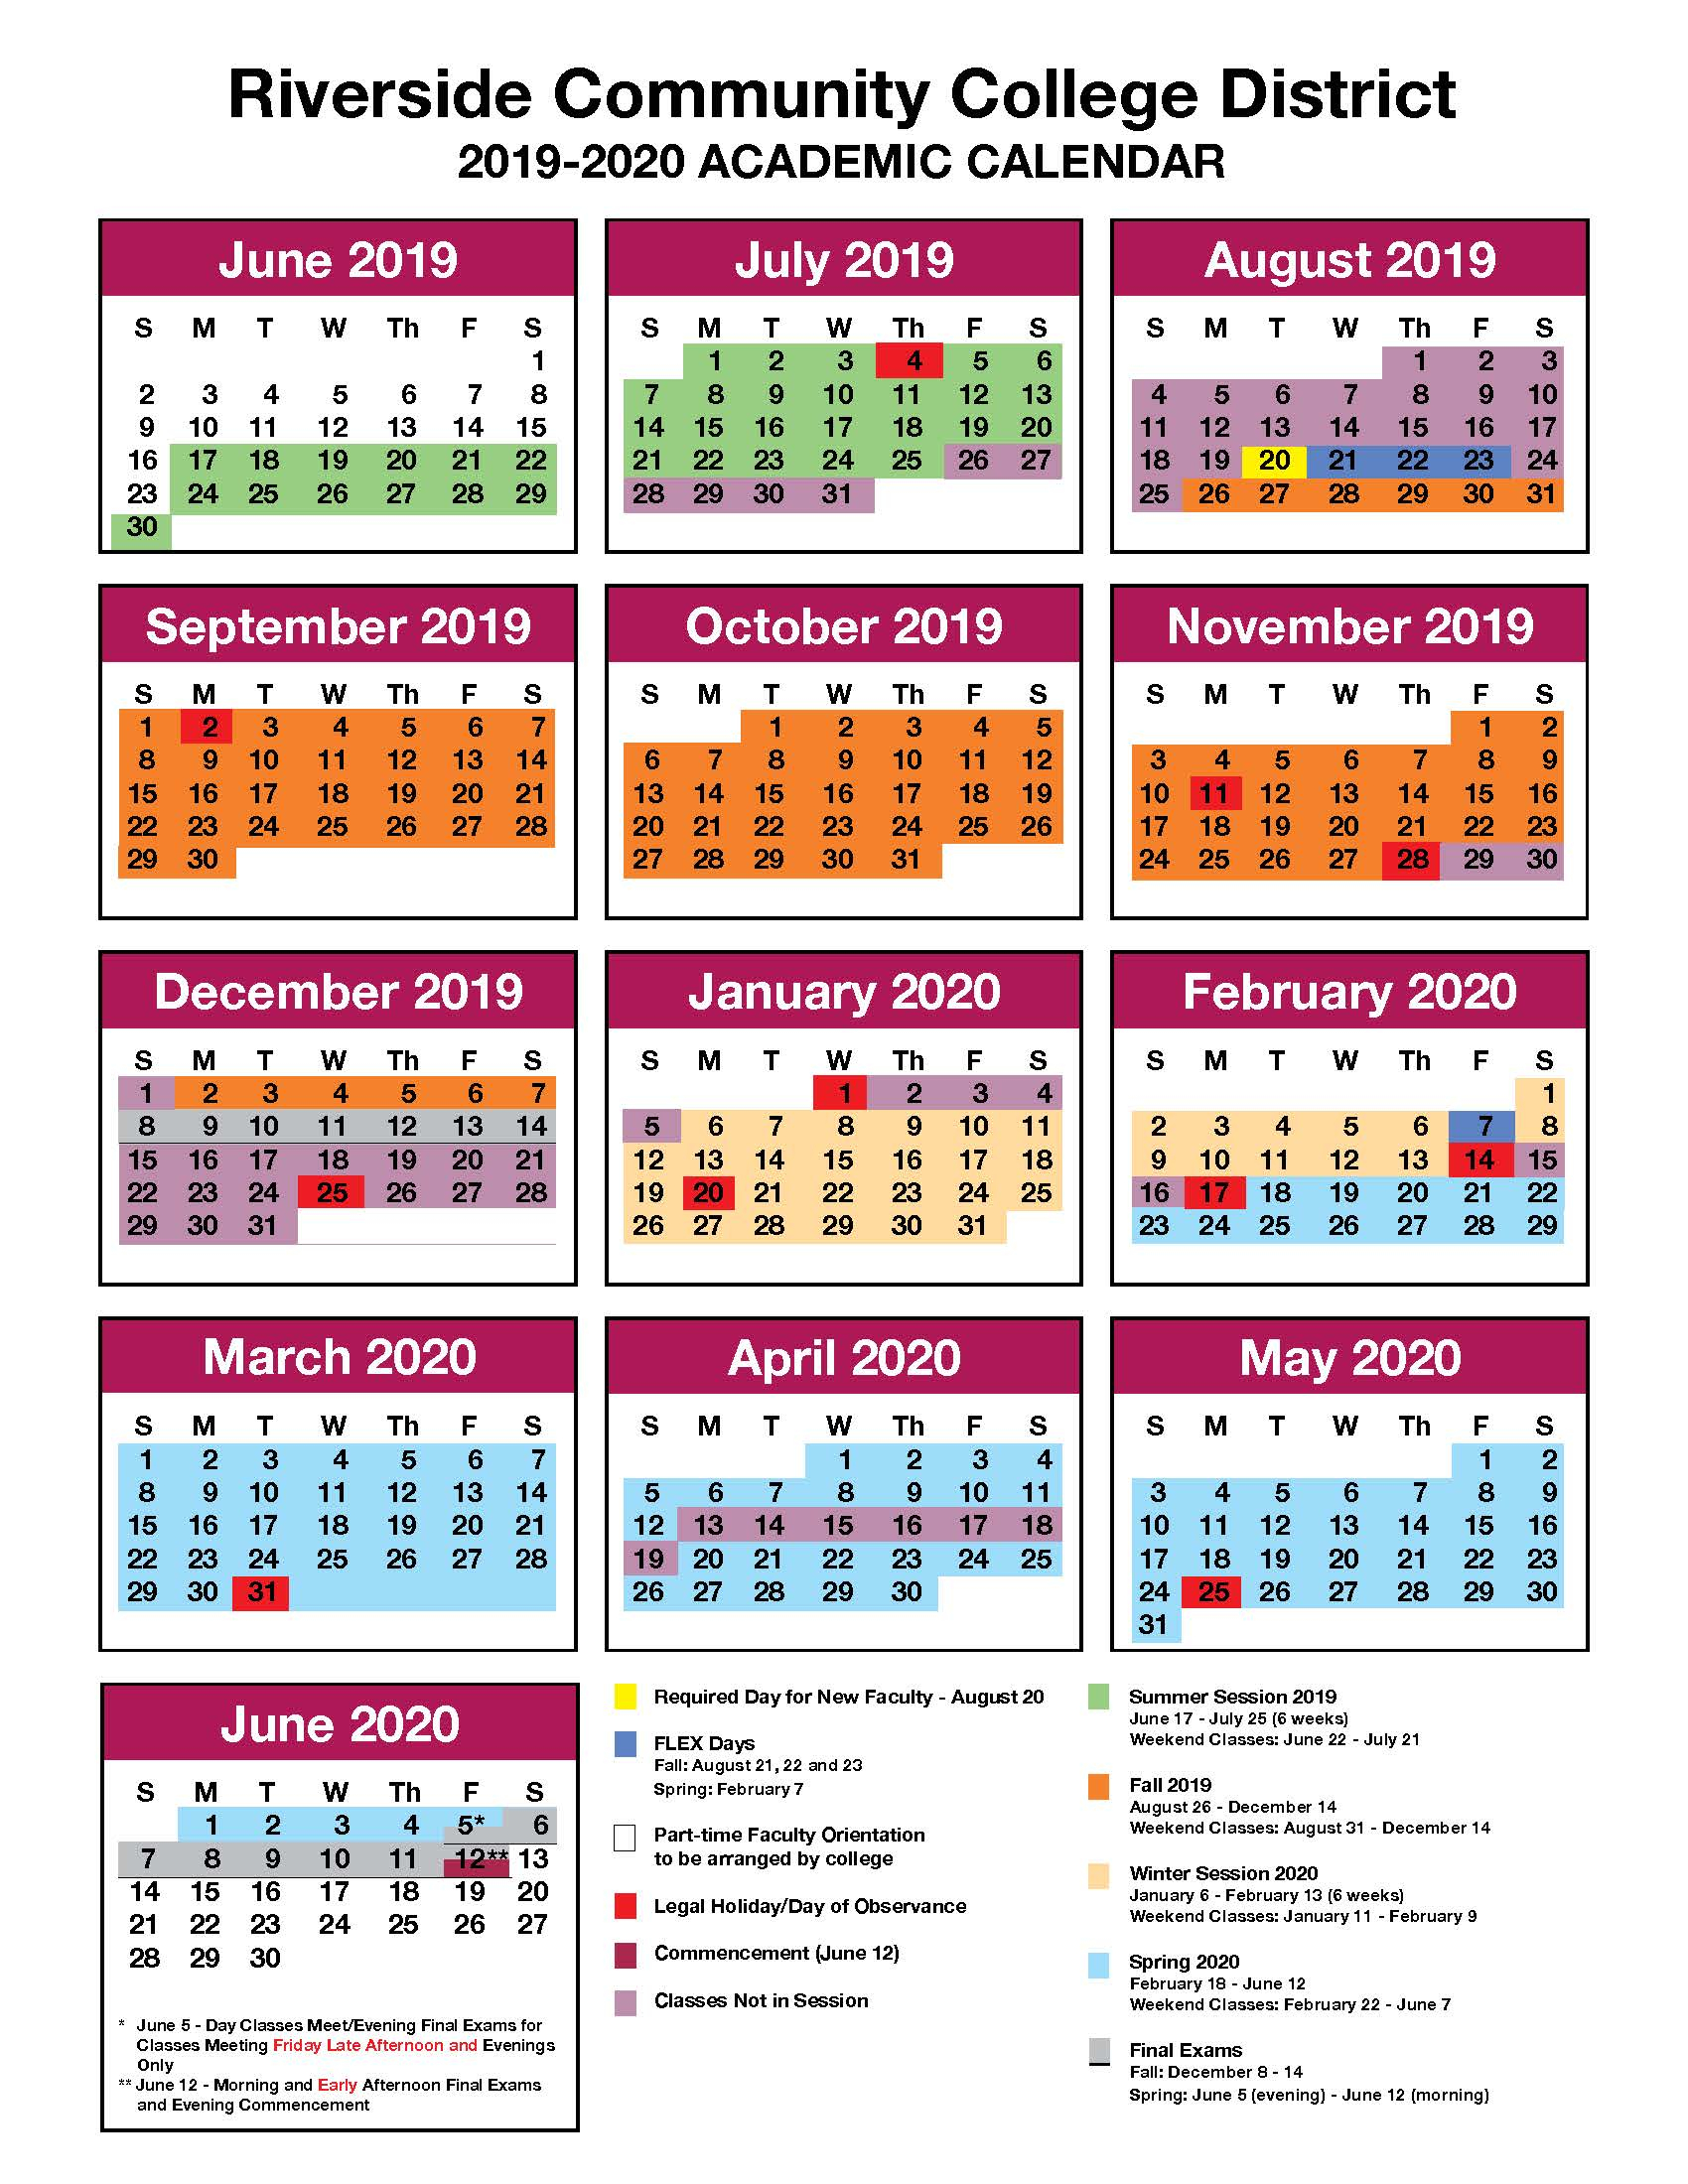 Jfk And Norco College Calendar 2019 2020 - John F. Kennedy Regarding Corona Unified School District Calendar